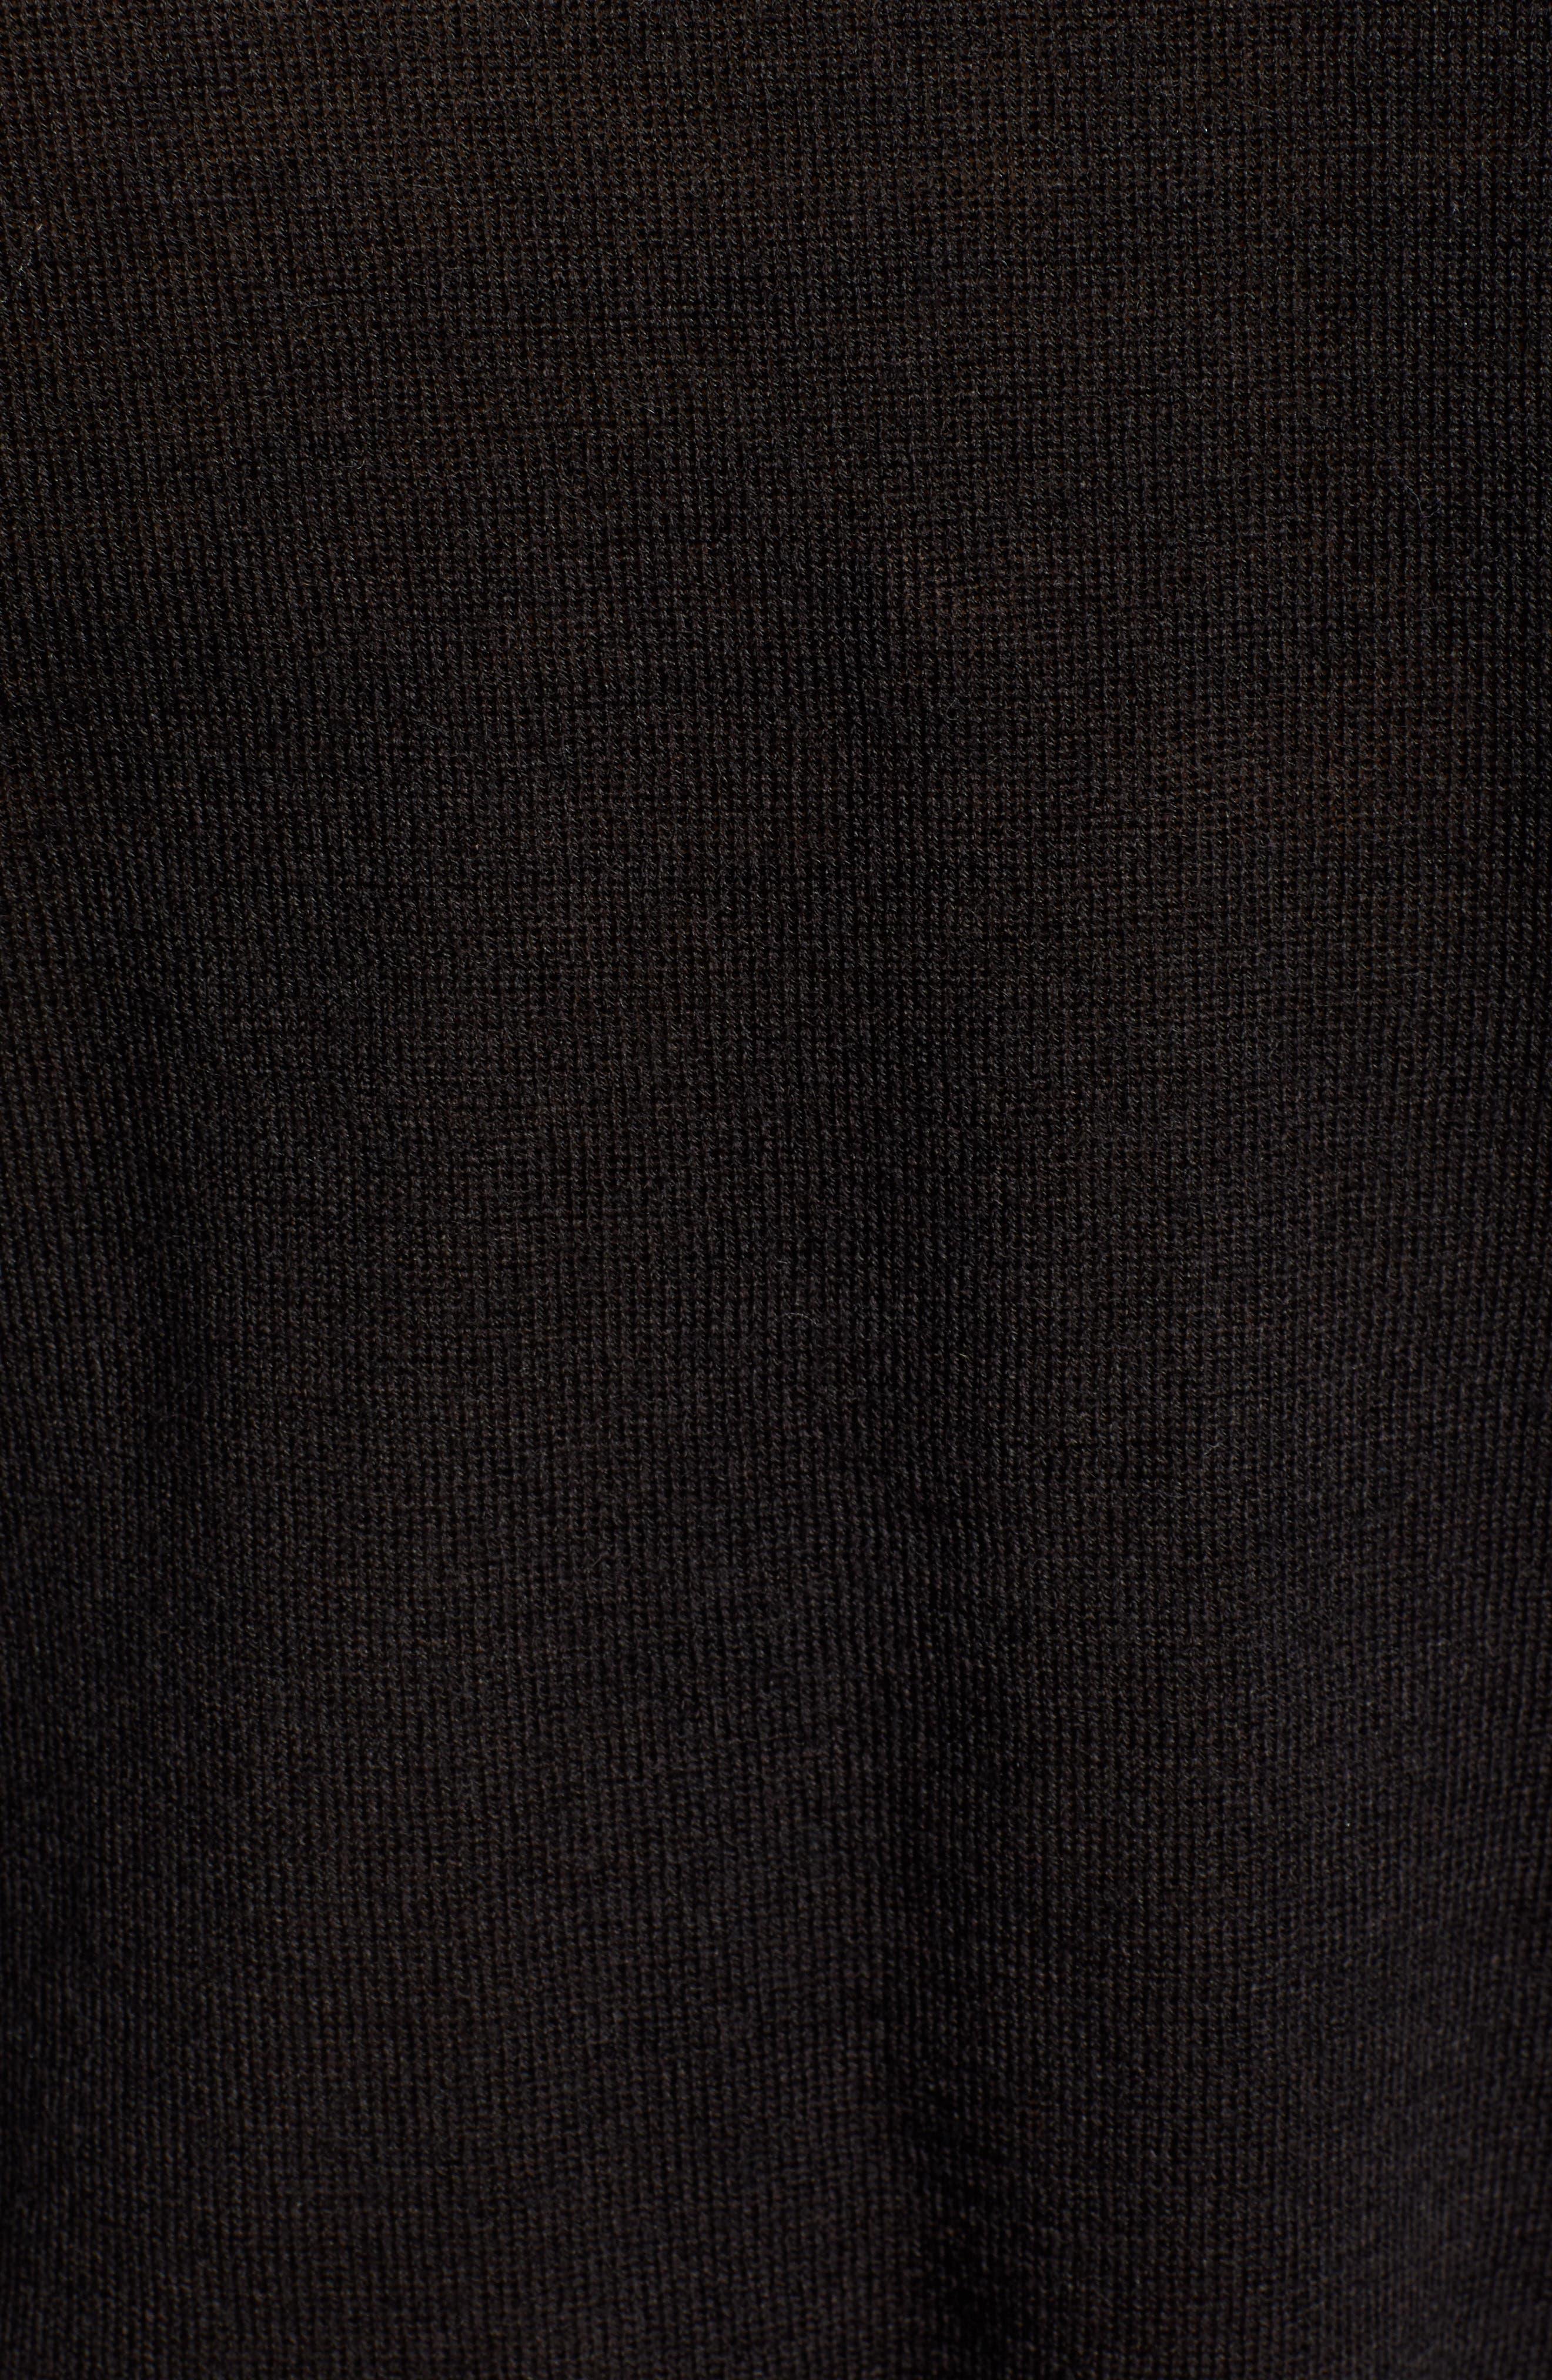 Perfect Fit Turtleneck,                             Alternate thumbnail 5, color,                             BLACK